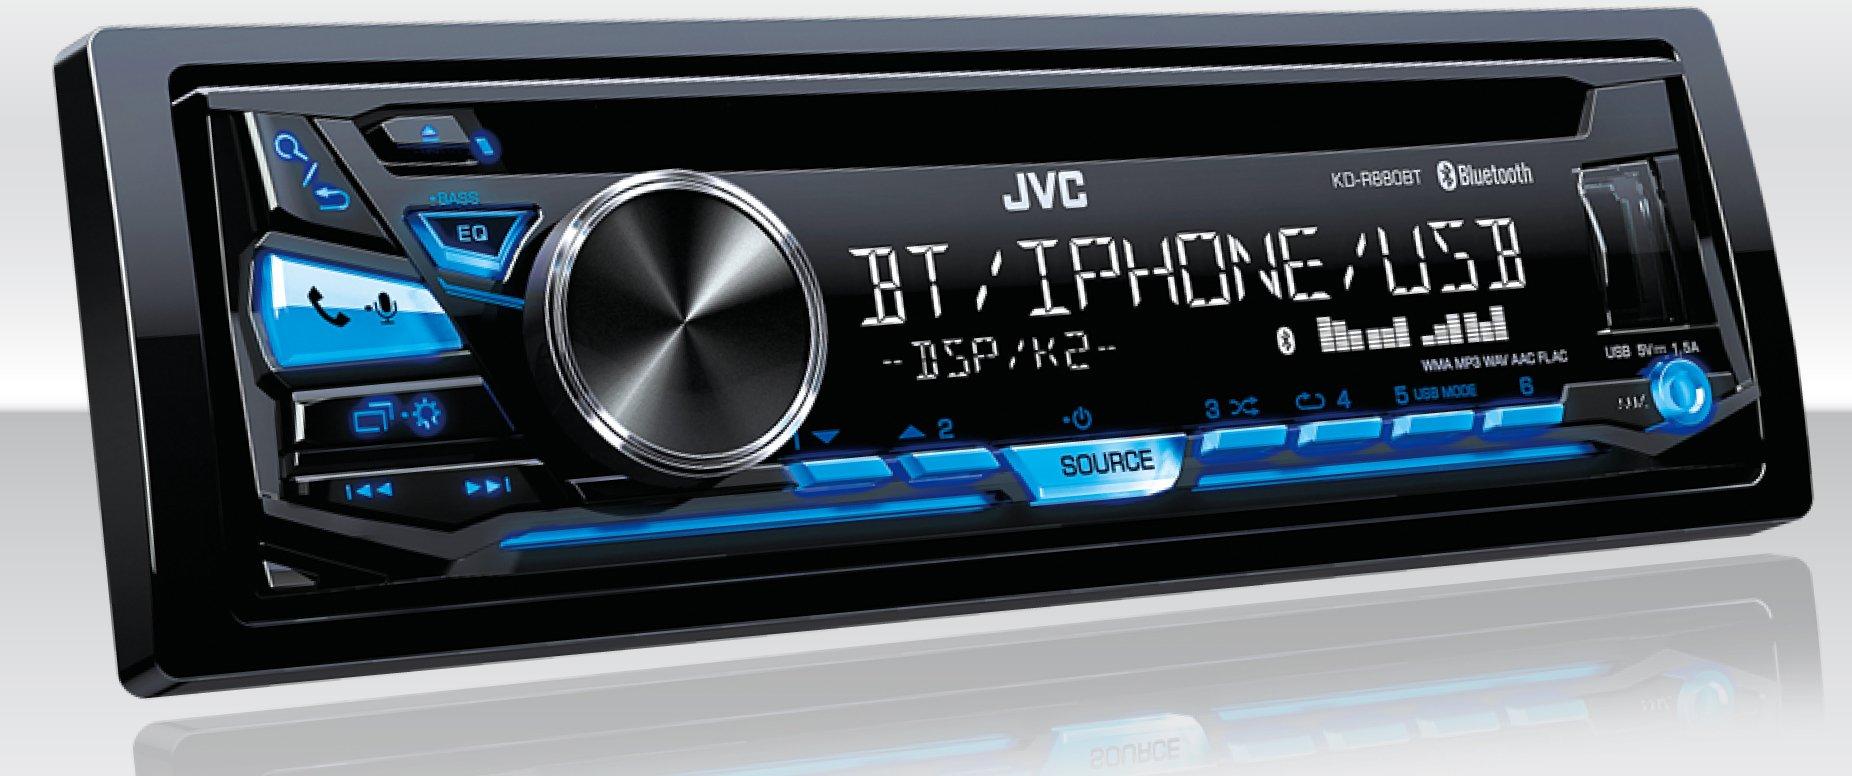 JVC In-Dash CD Receiver (KD-R880BT)